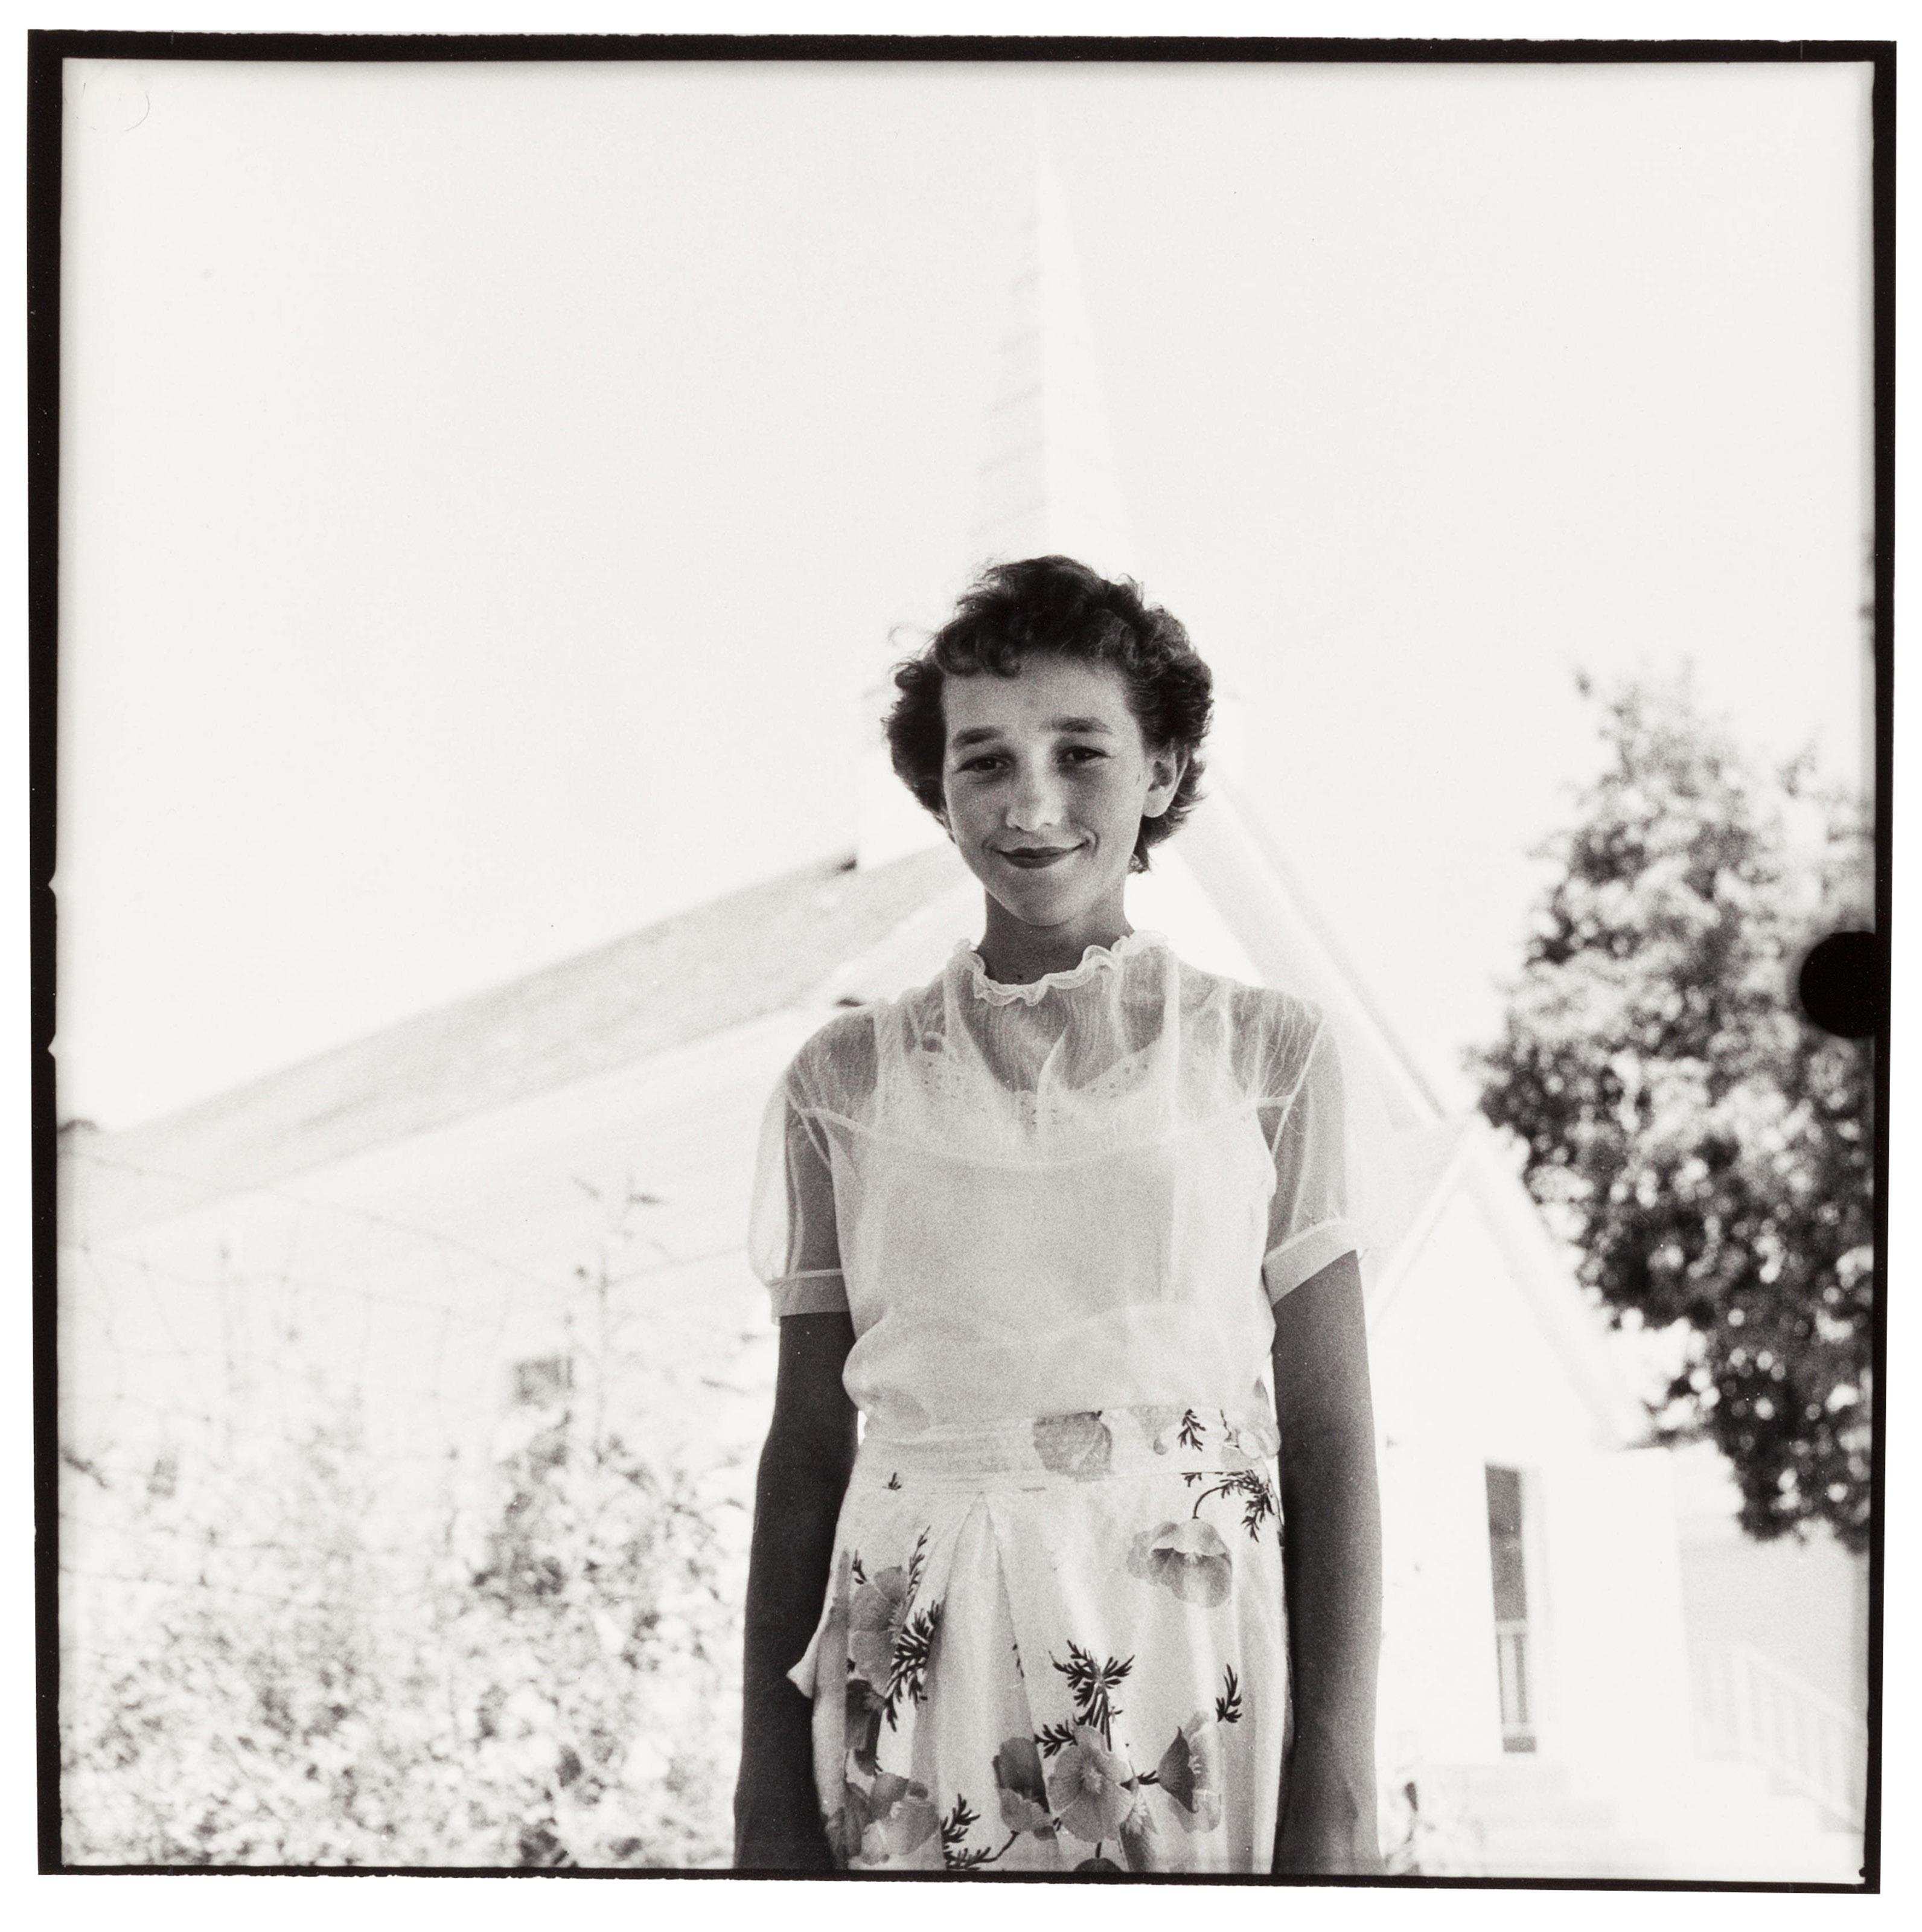 Jonelle Allen,Pam Ferris (born 1948 (born in Hanover, West Germany) Erotic picture Wanda McKay,John Neville (1925?011)